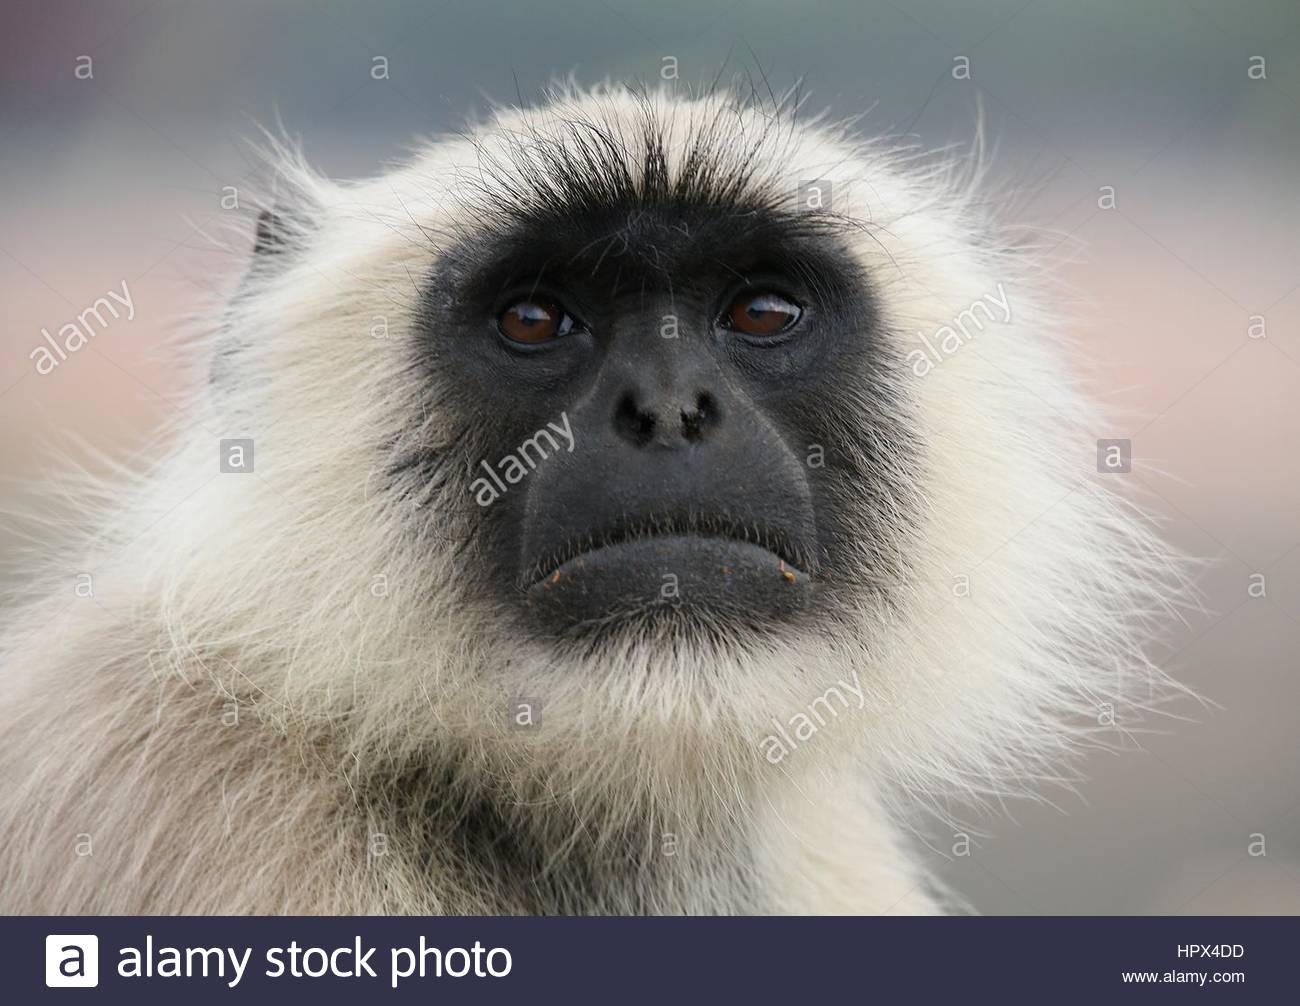 Gray Langur, Monkey face - Stock Image